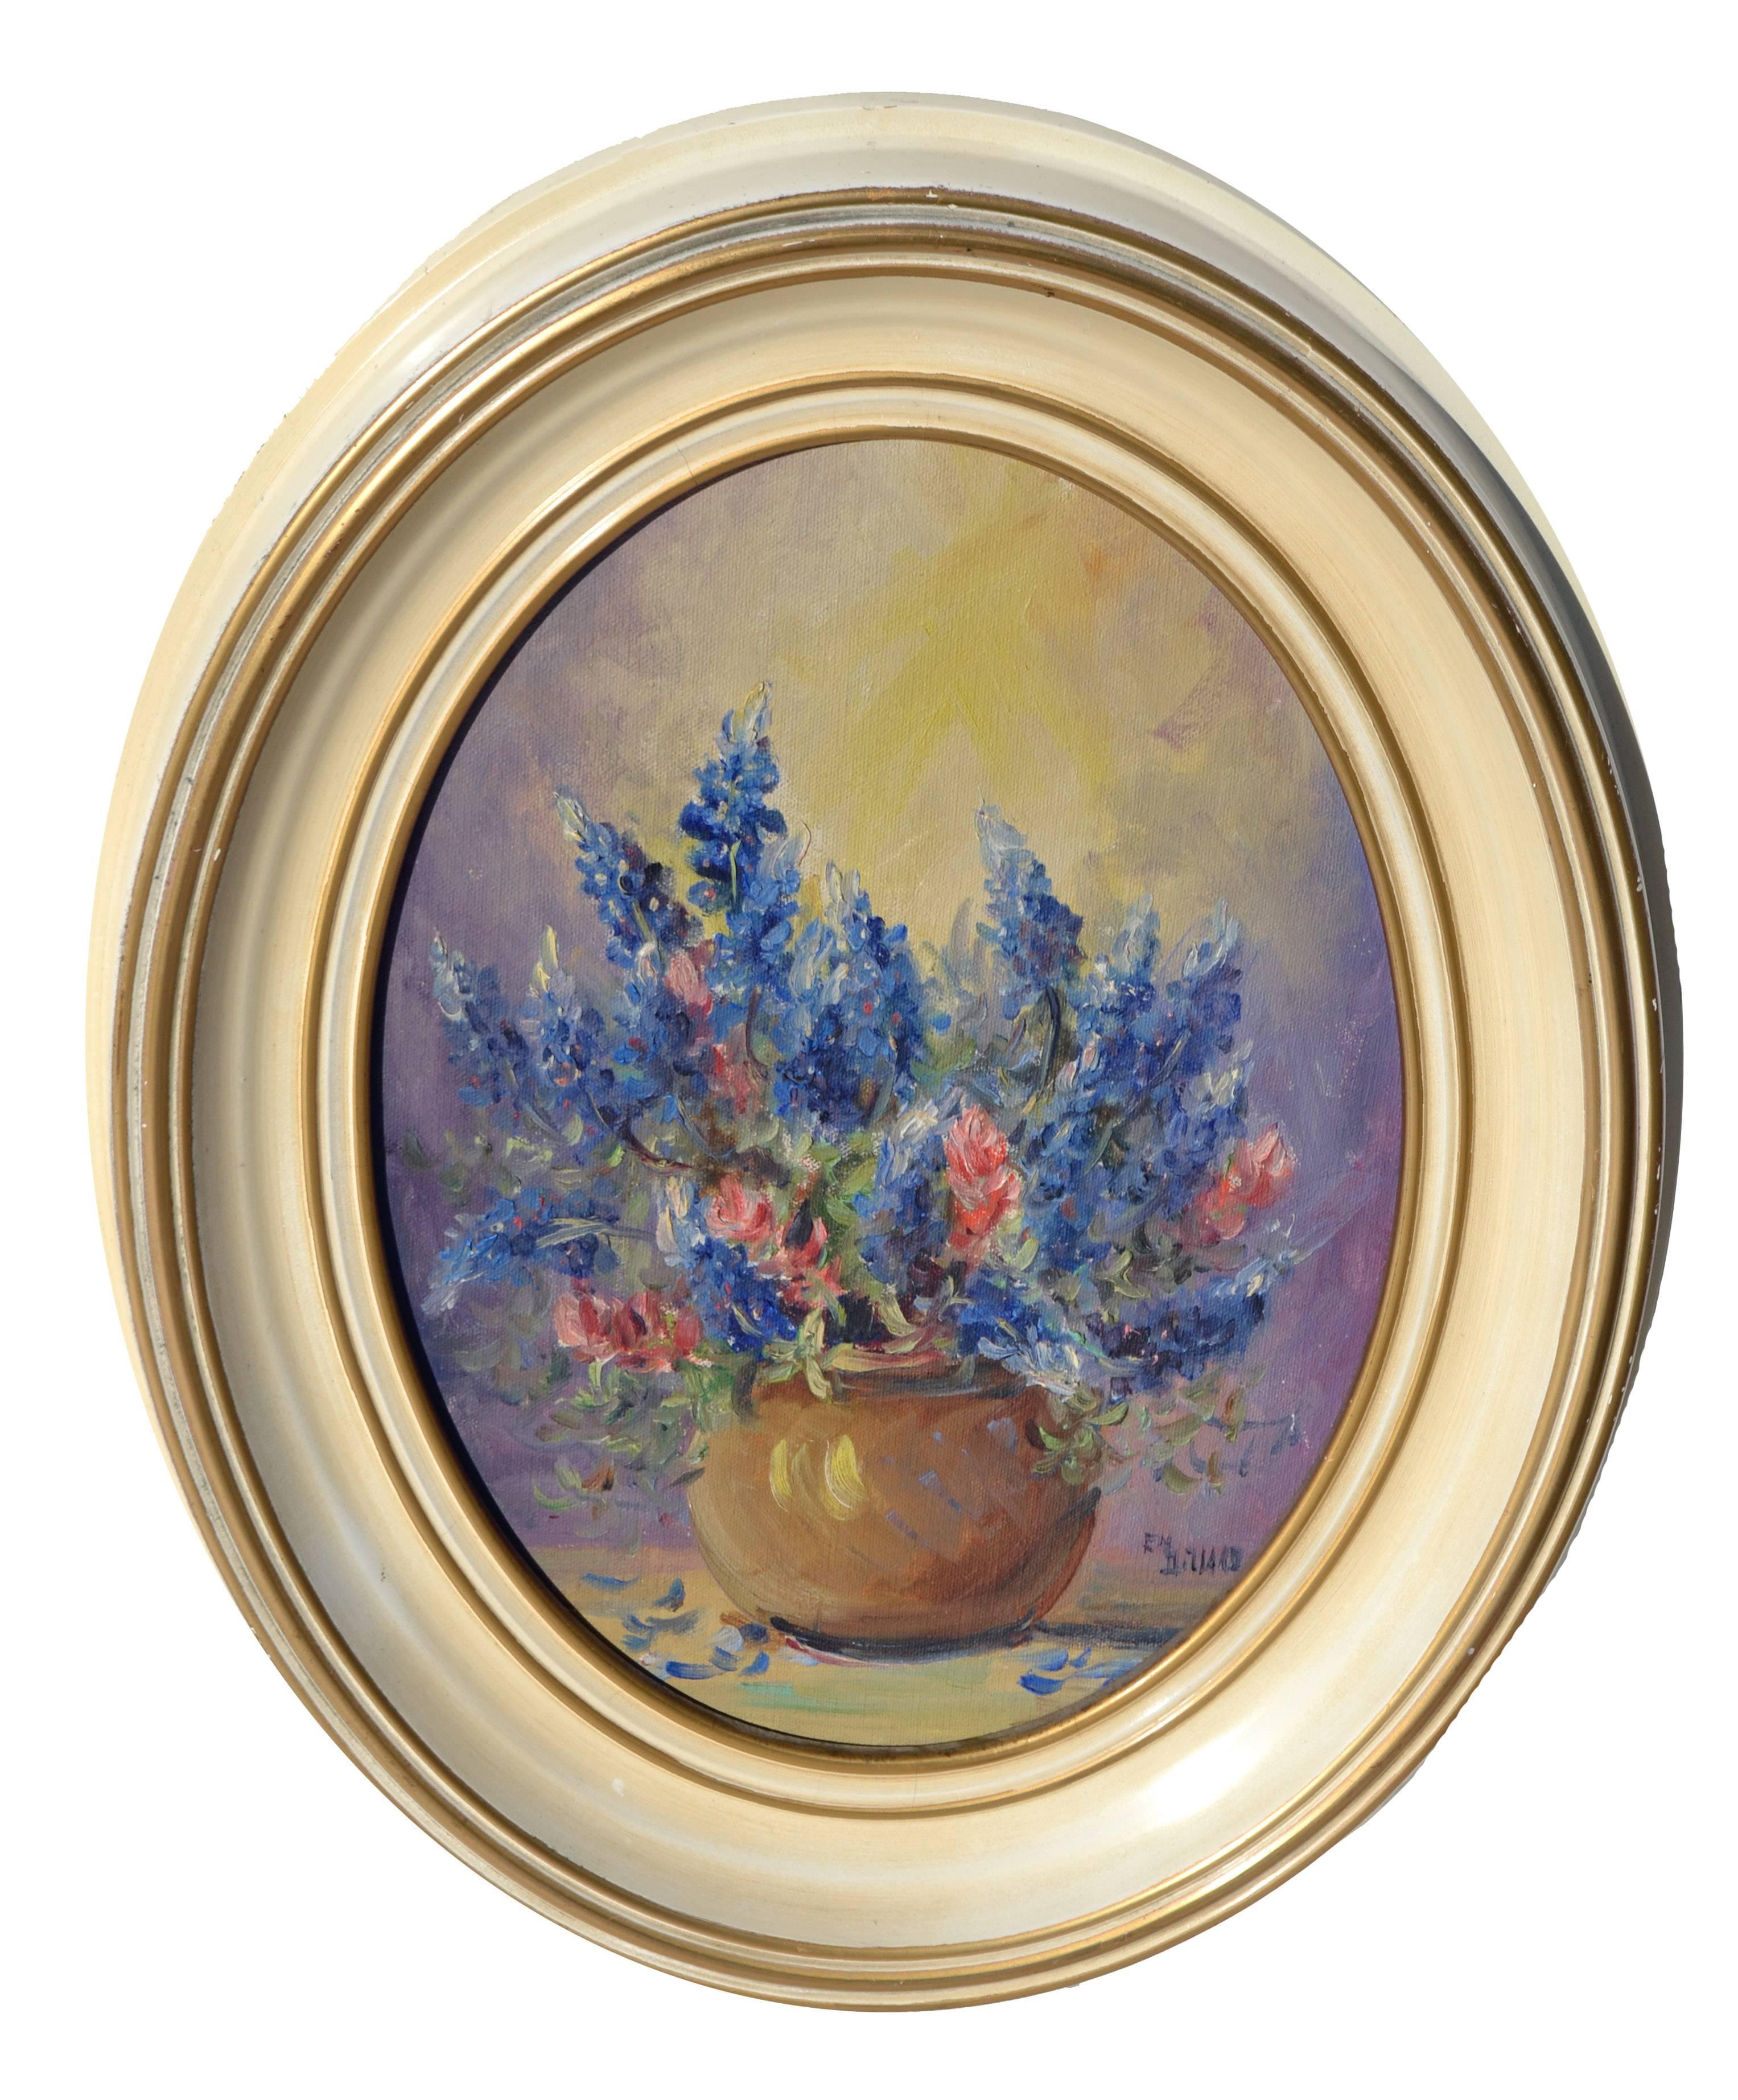 Texas Bluebonnet Bouquet - Mid Century Floral Still Life